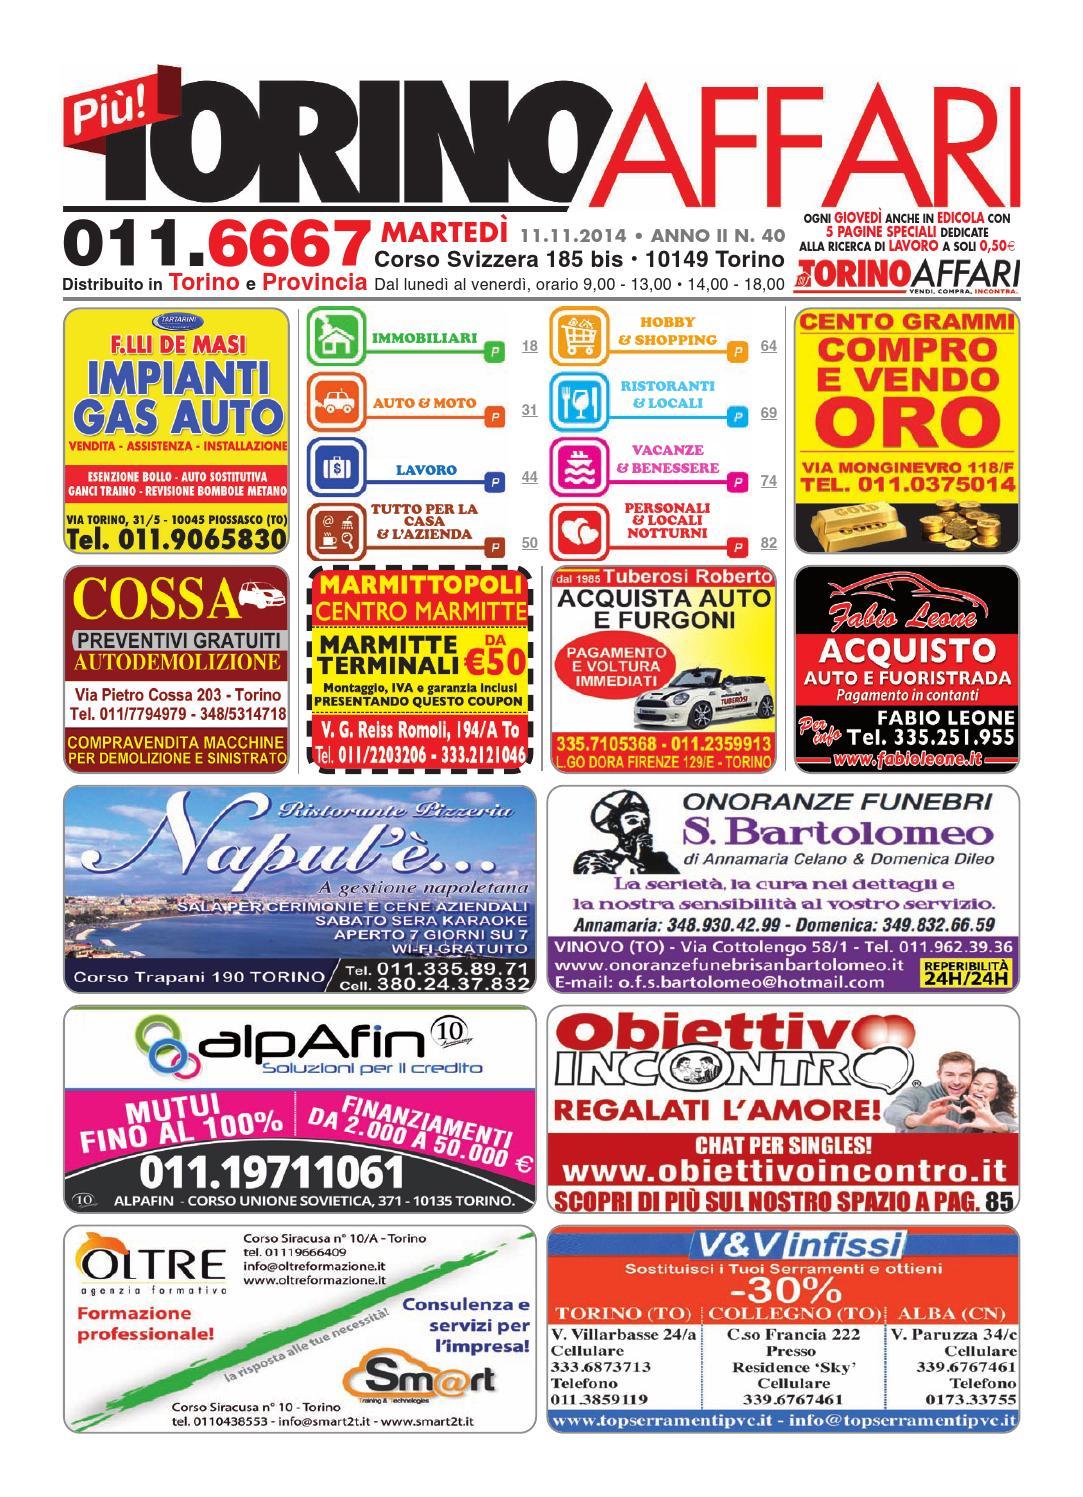 Sae Arredo Bagno Torino.Piu Torino Affari Ed Free 40 Del 11 11 2014 By Torino Affari Issuu